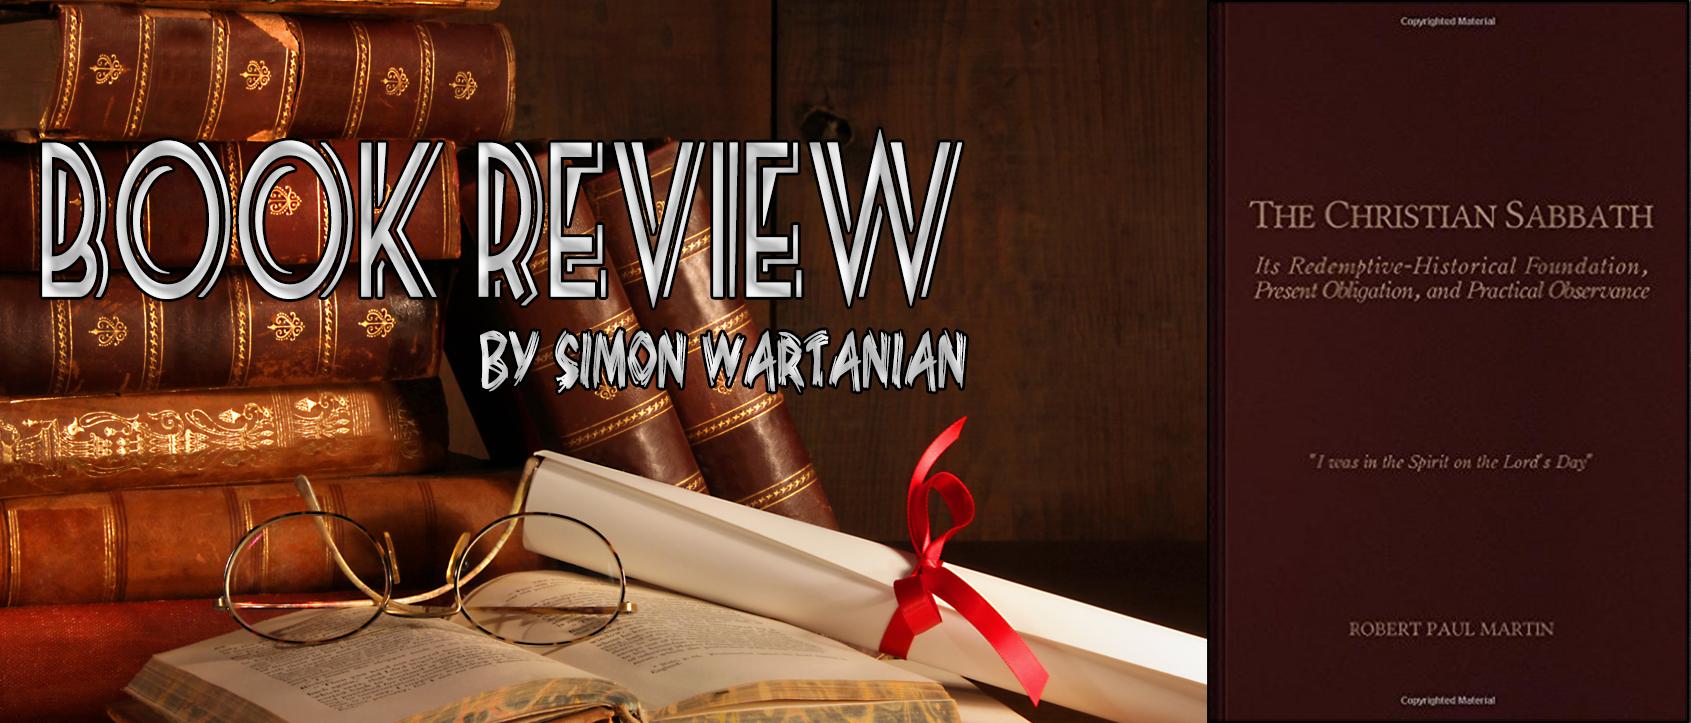 A Review Of Robert Martin's The Christian Sabbath